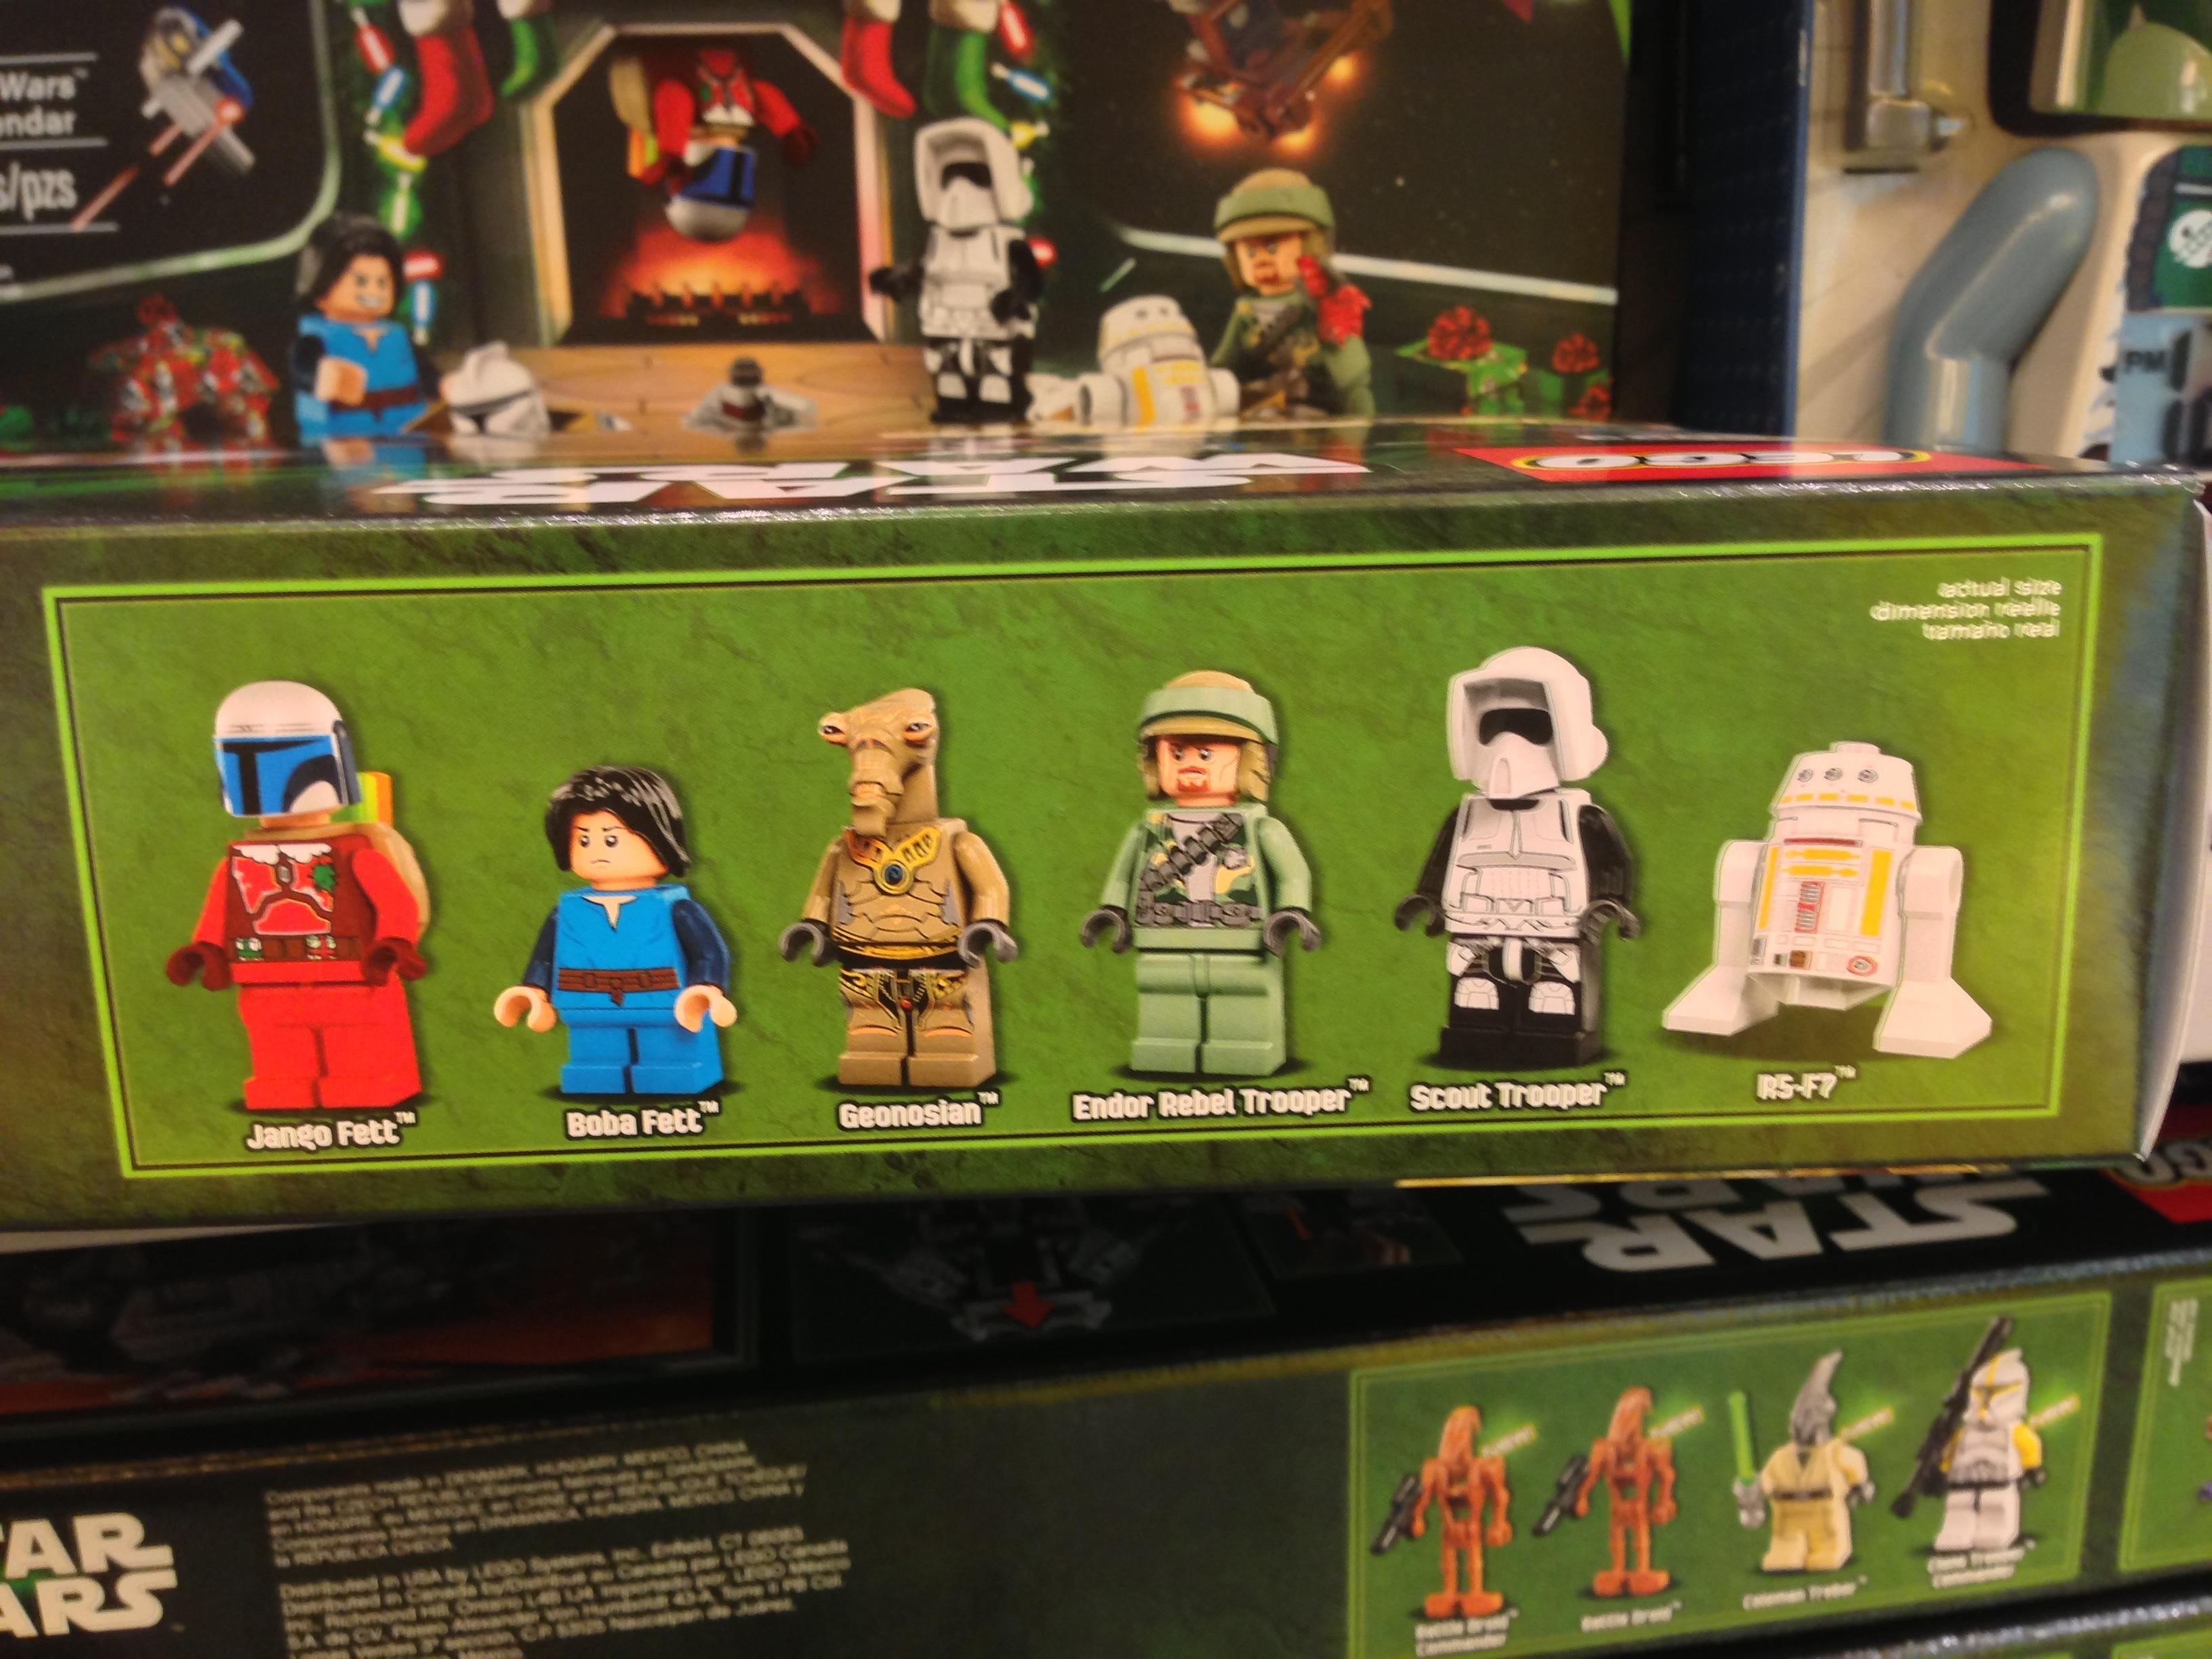 Robonino Lego Star Wars 3 Cheat Code. with Lego Advent Calendar 2013 Cheat Codes